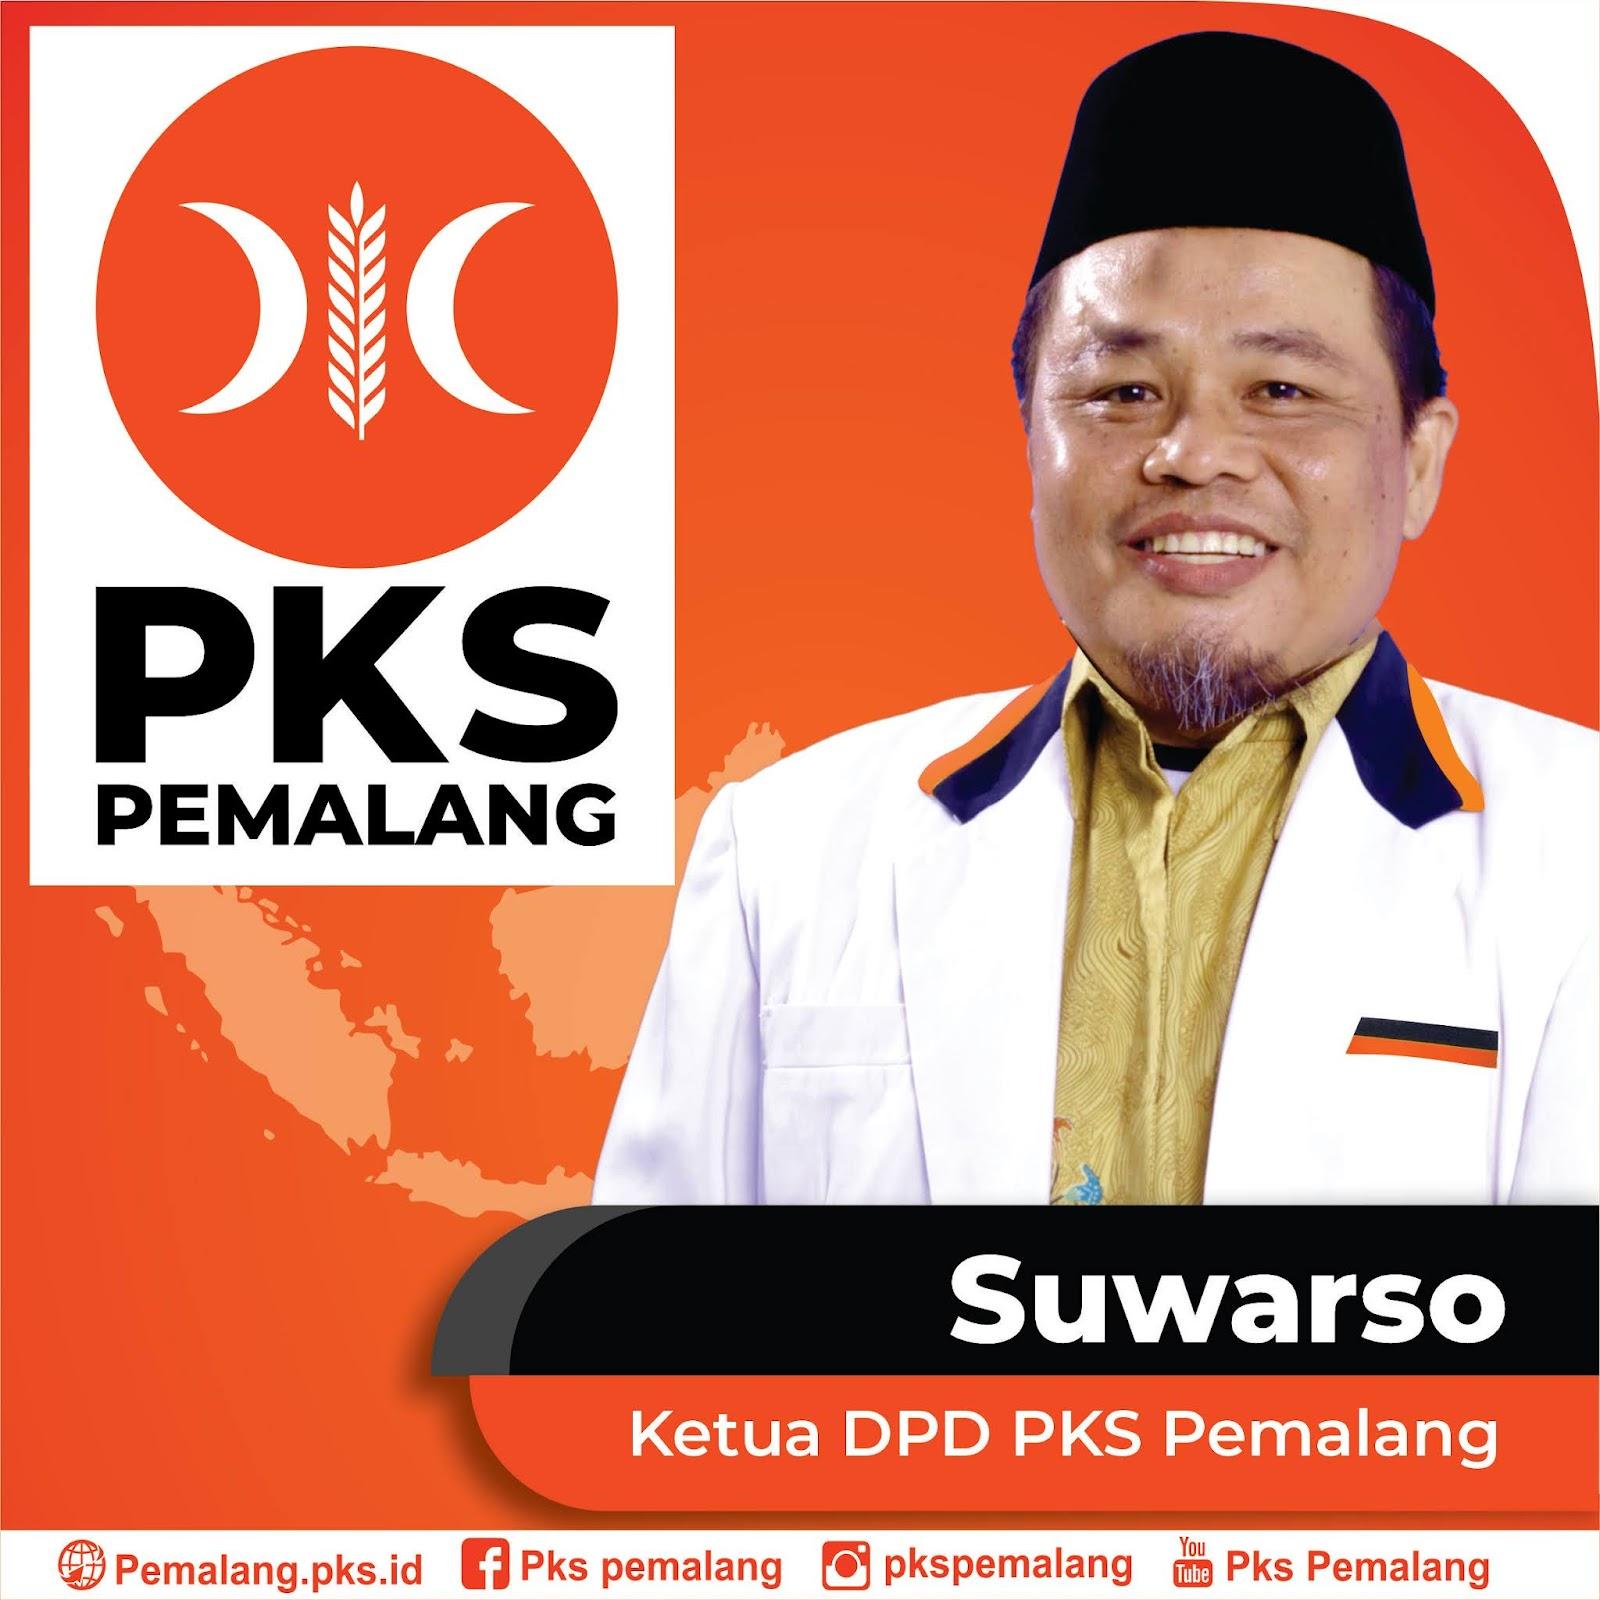 PKS Pemalang